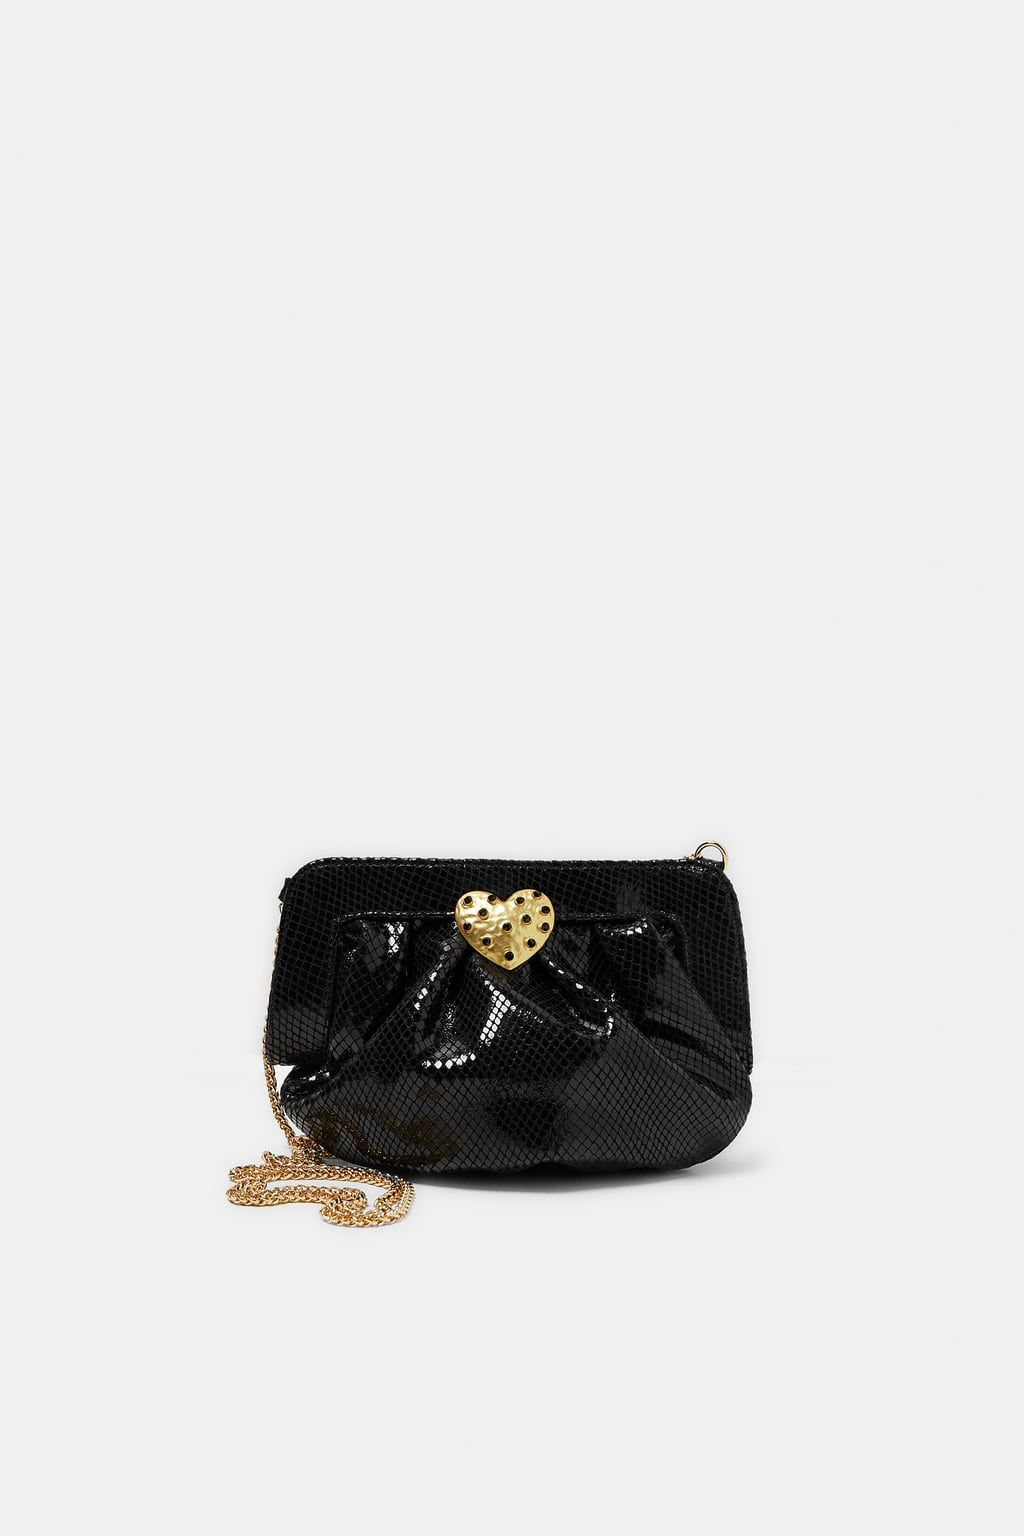 81a4dbf96 BOLSO PIEL GRABADO SERPIENTE   Zara   Bags, Leather Bag och Snake skin